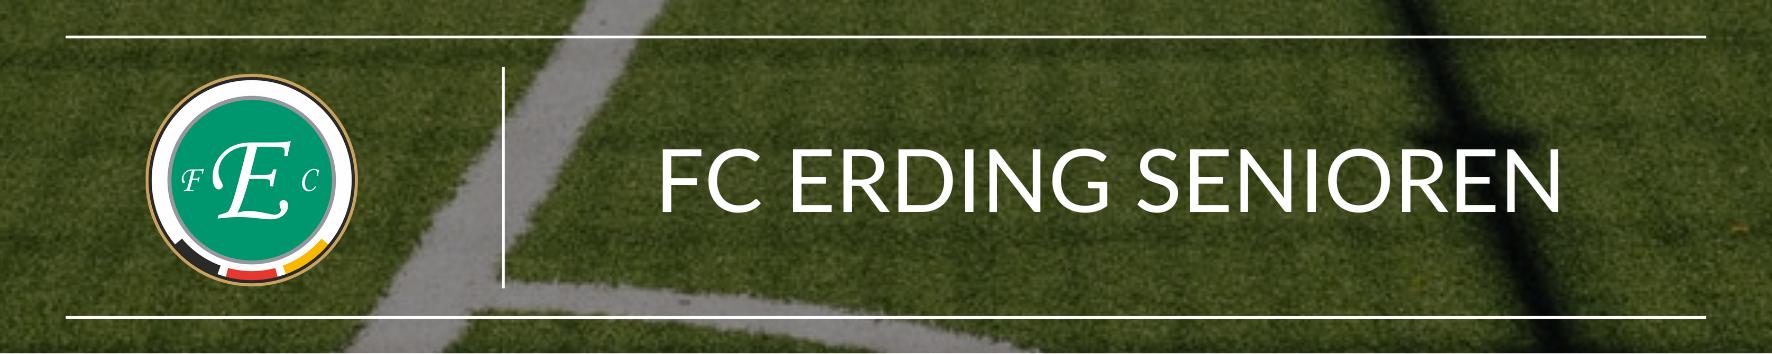 FC Erding Senioren